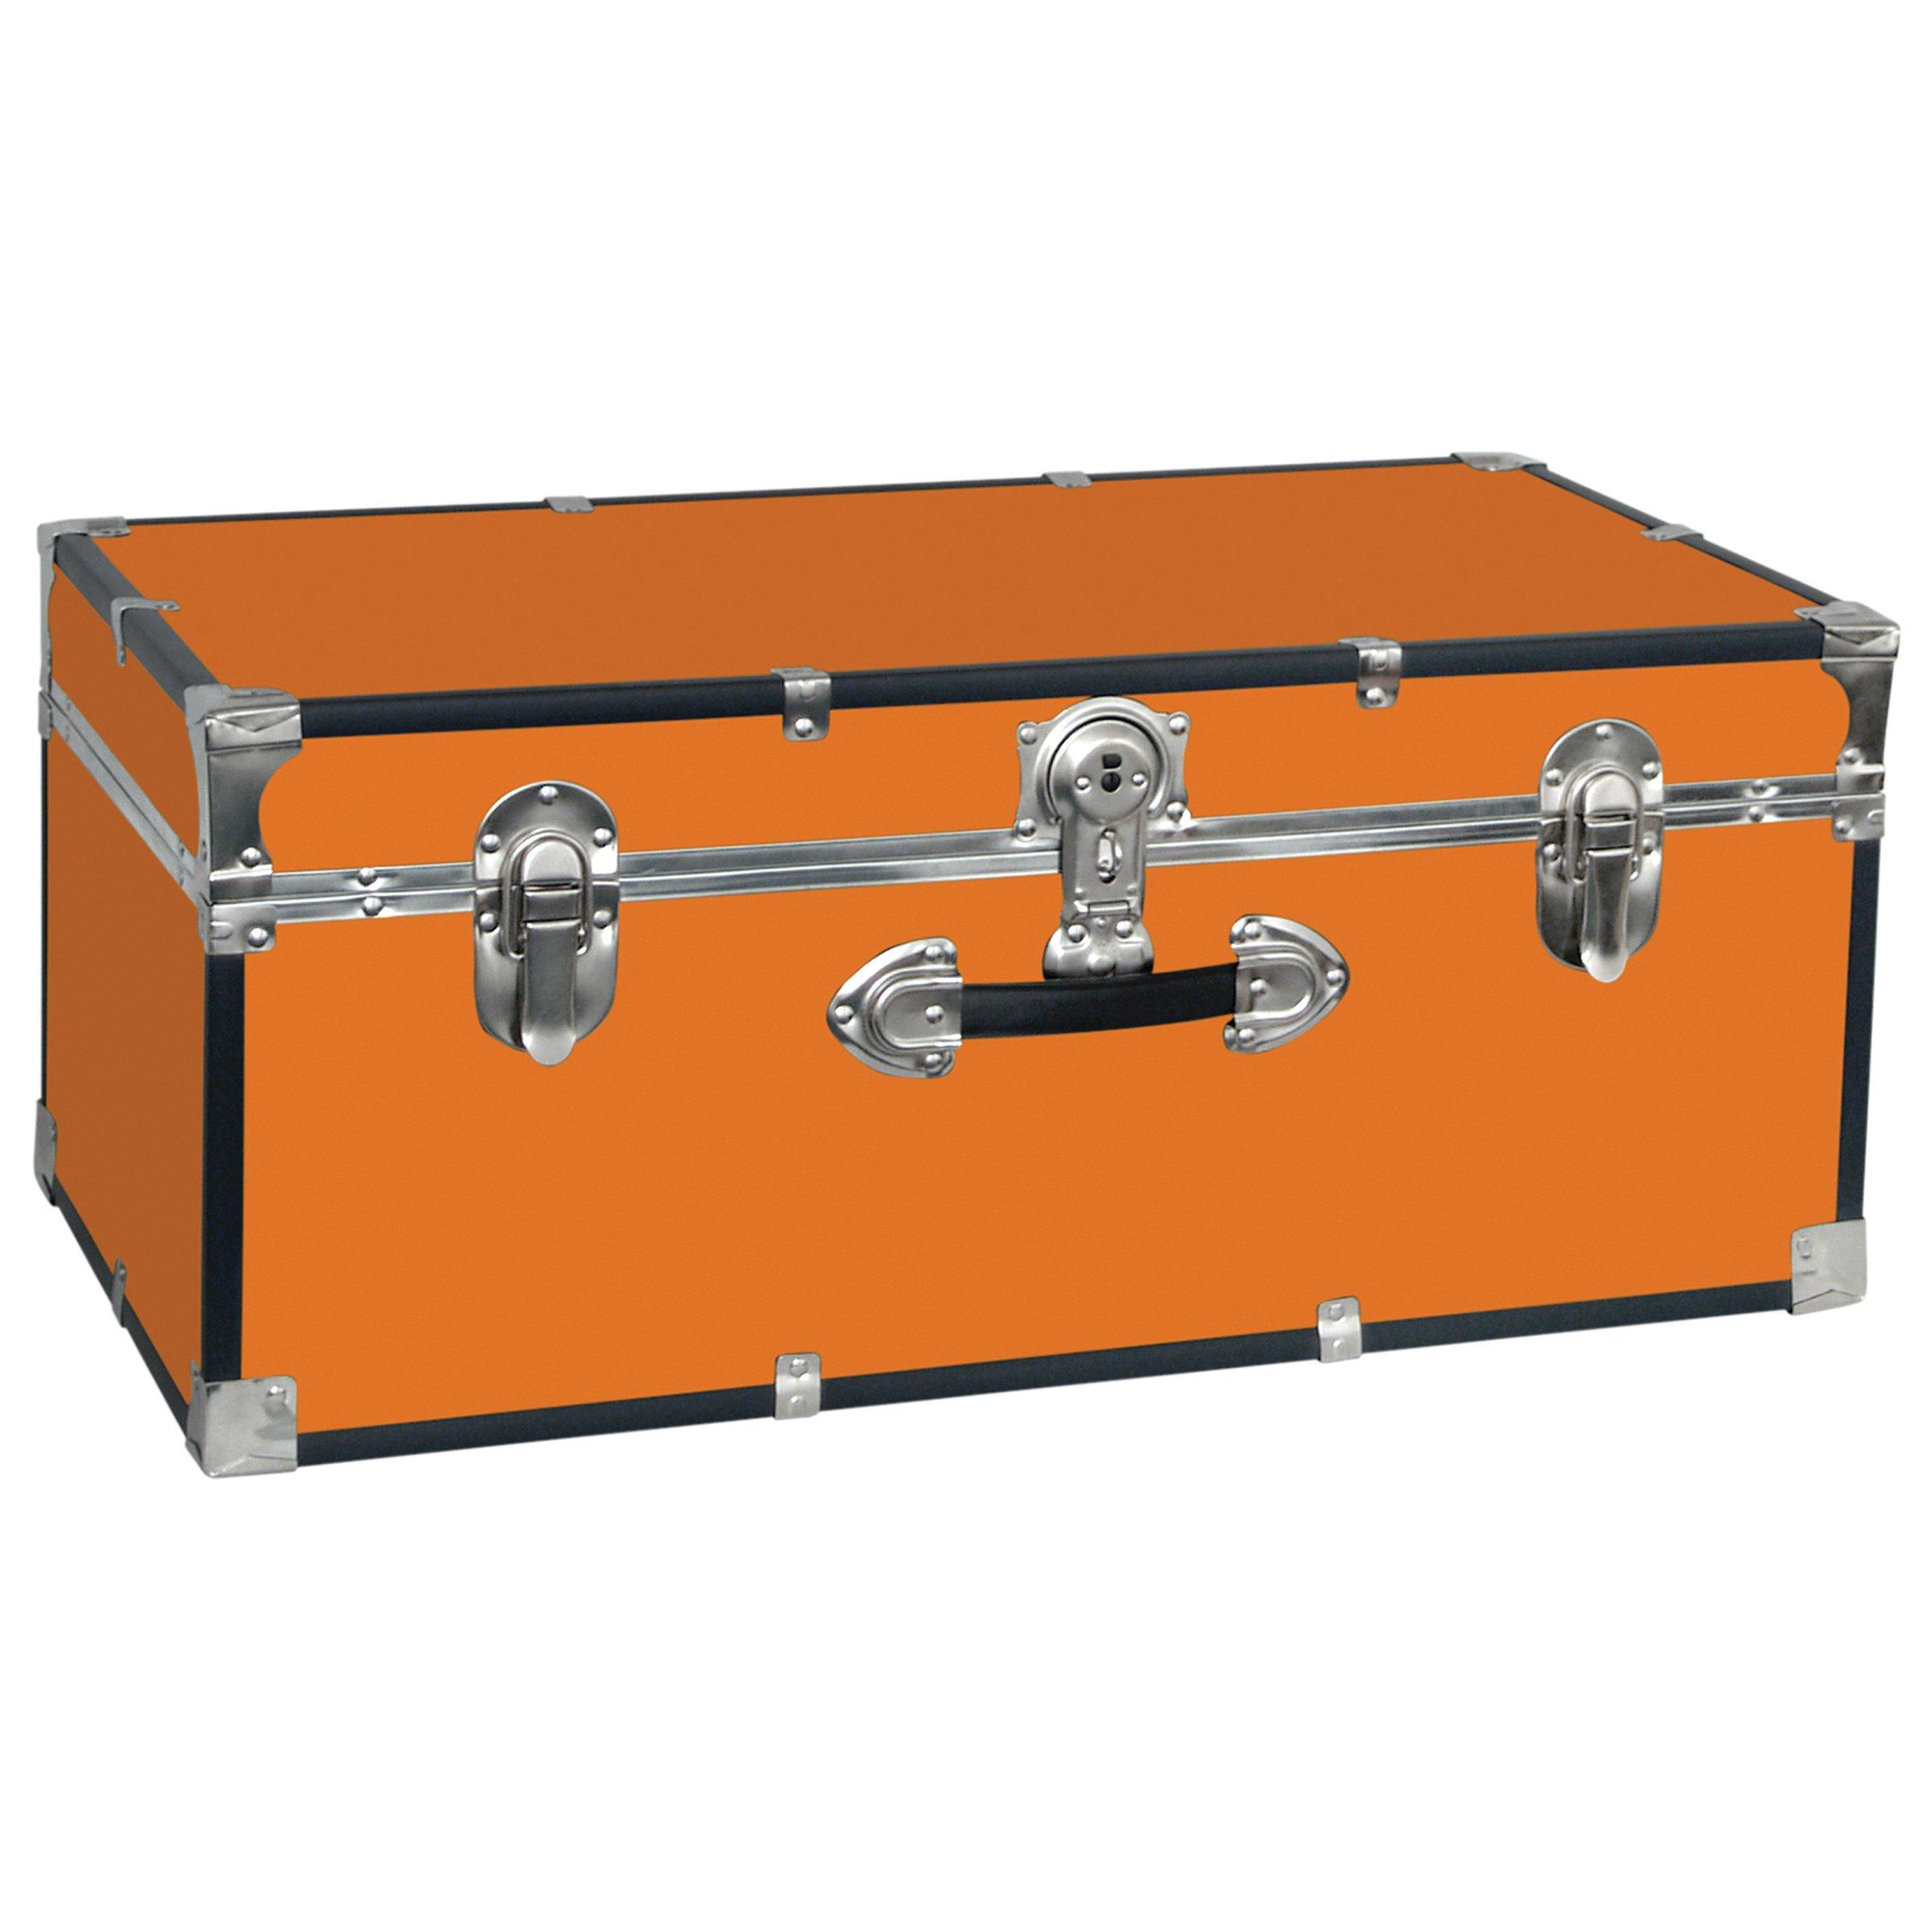 Seward Trunk College Dorm and Camp Storage Footlocker Trunk, Orange, 30-Inch (SWD5120-20)